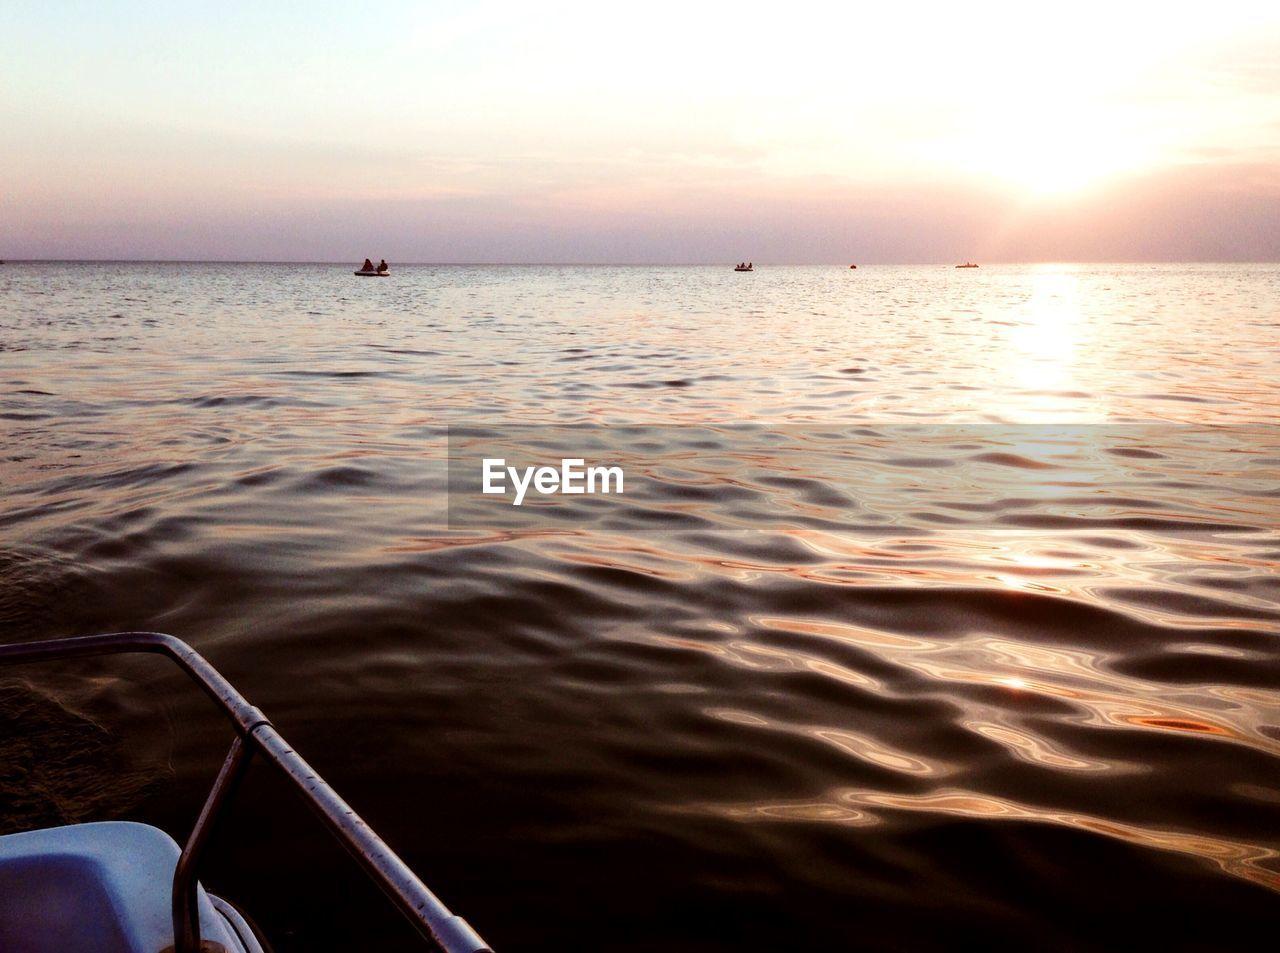 water, sky, beauty in nature, nautical vessel, sea, scenics - nature, nature, sunset, mode of transportation, tranquility, transportation, tranquil scene, horizon, horizon over water, idyllic, outdoors, travel, sunlight, sailing